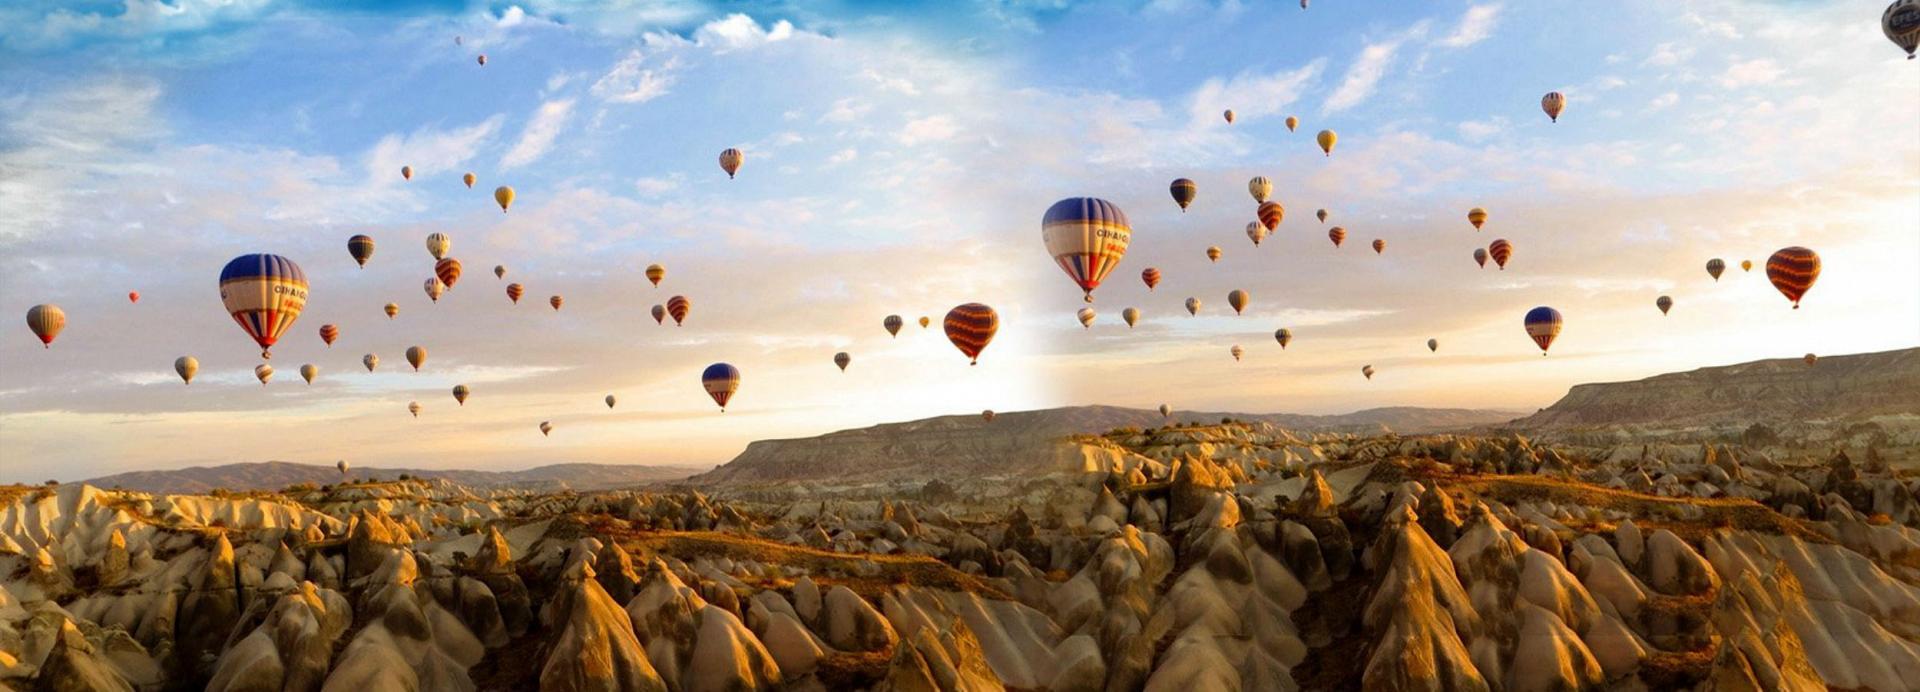 Turchia archeologica e Cappadocia